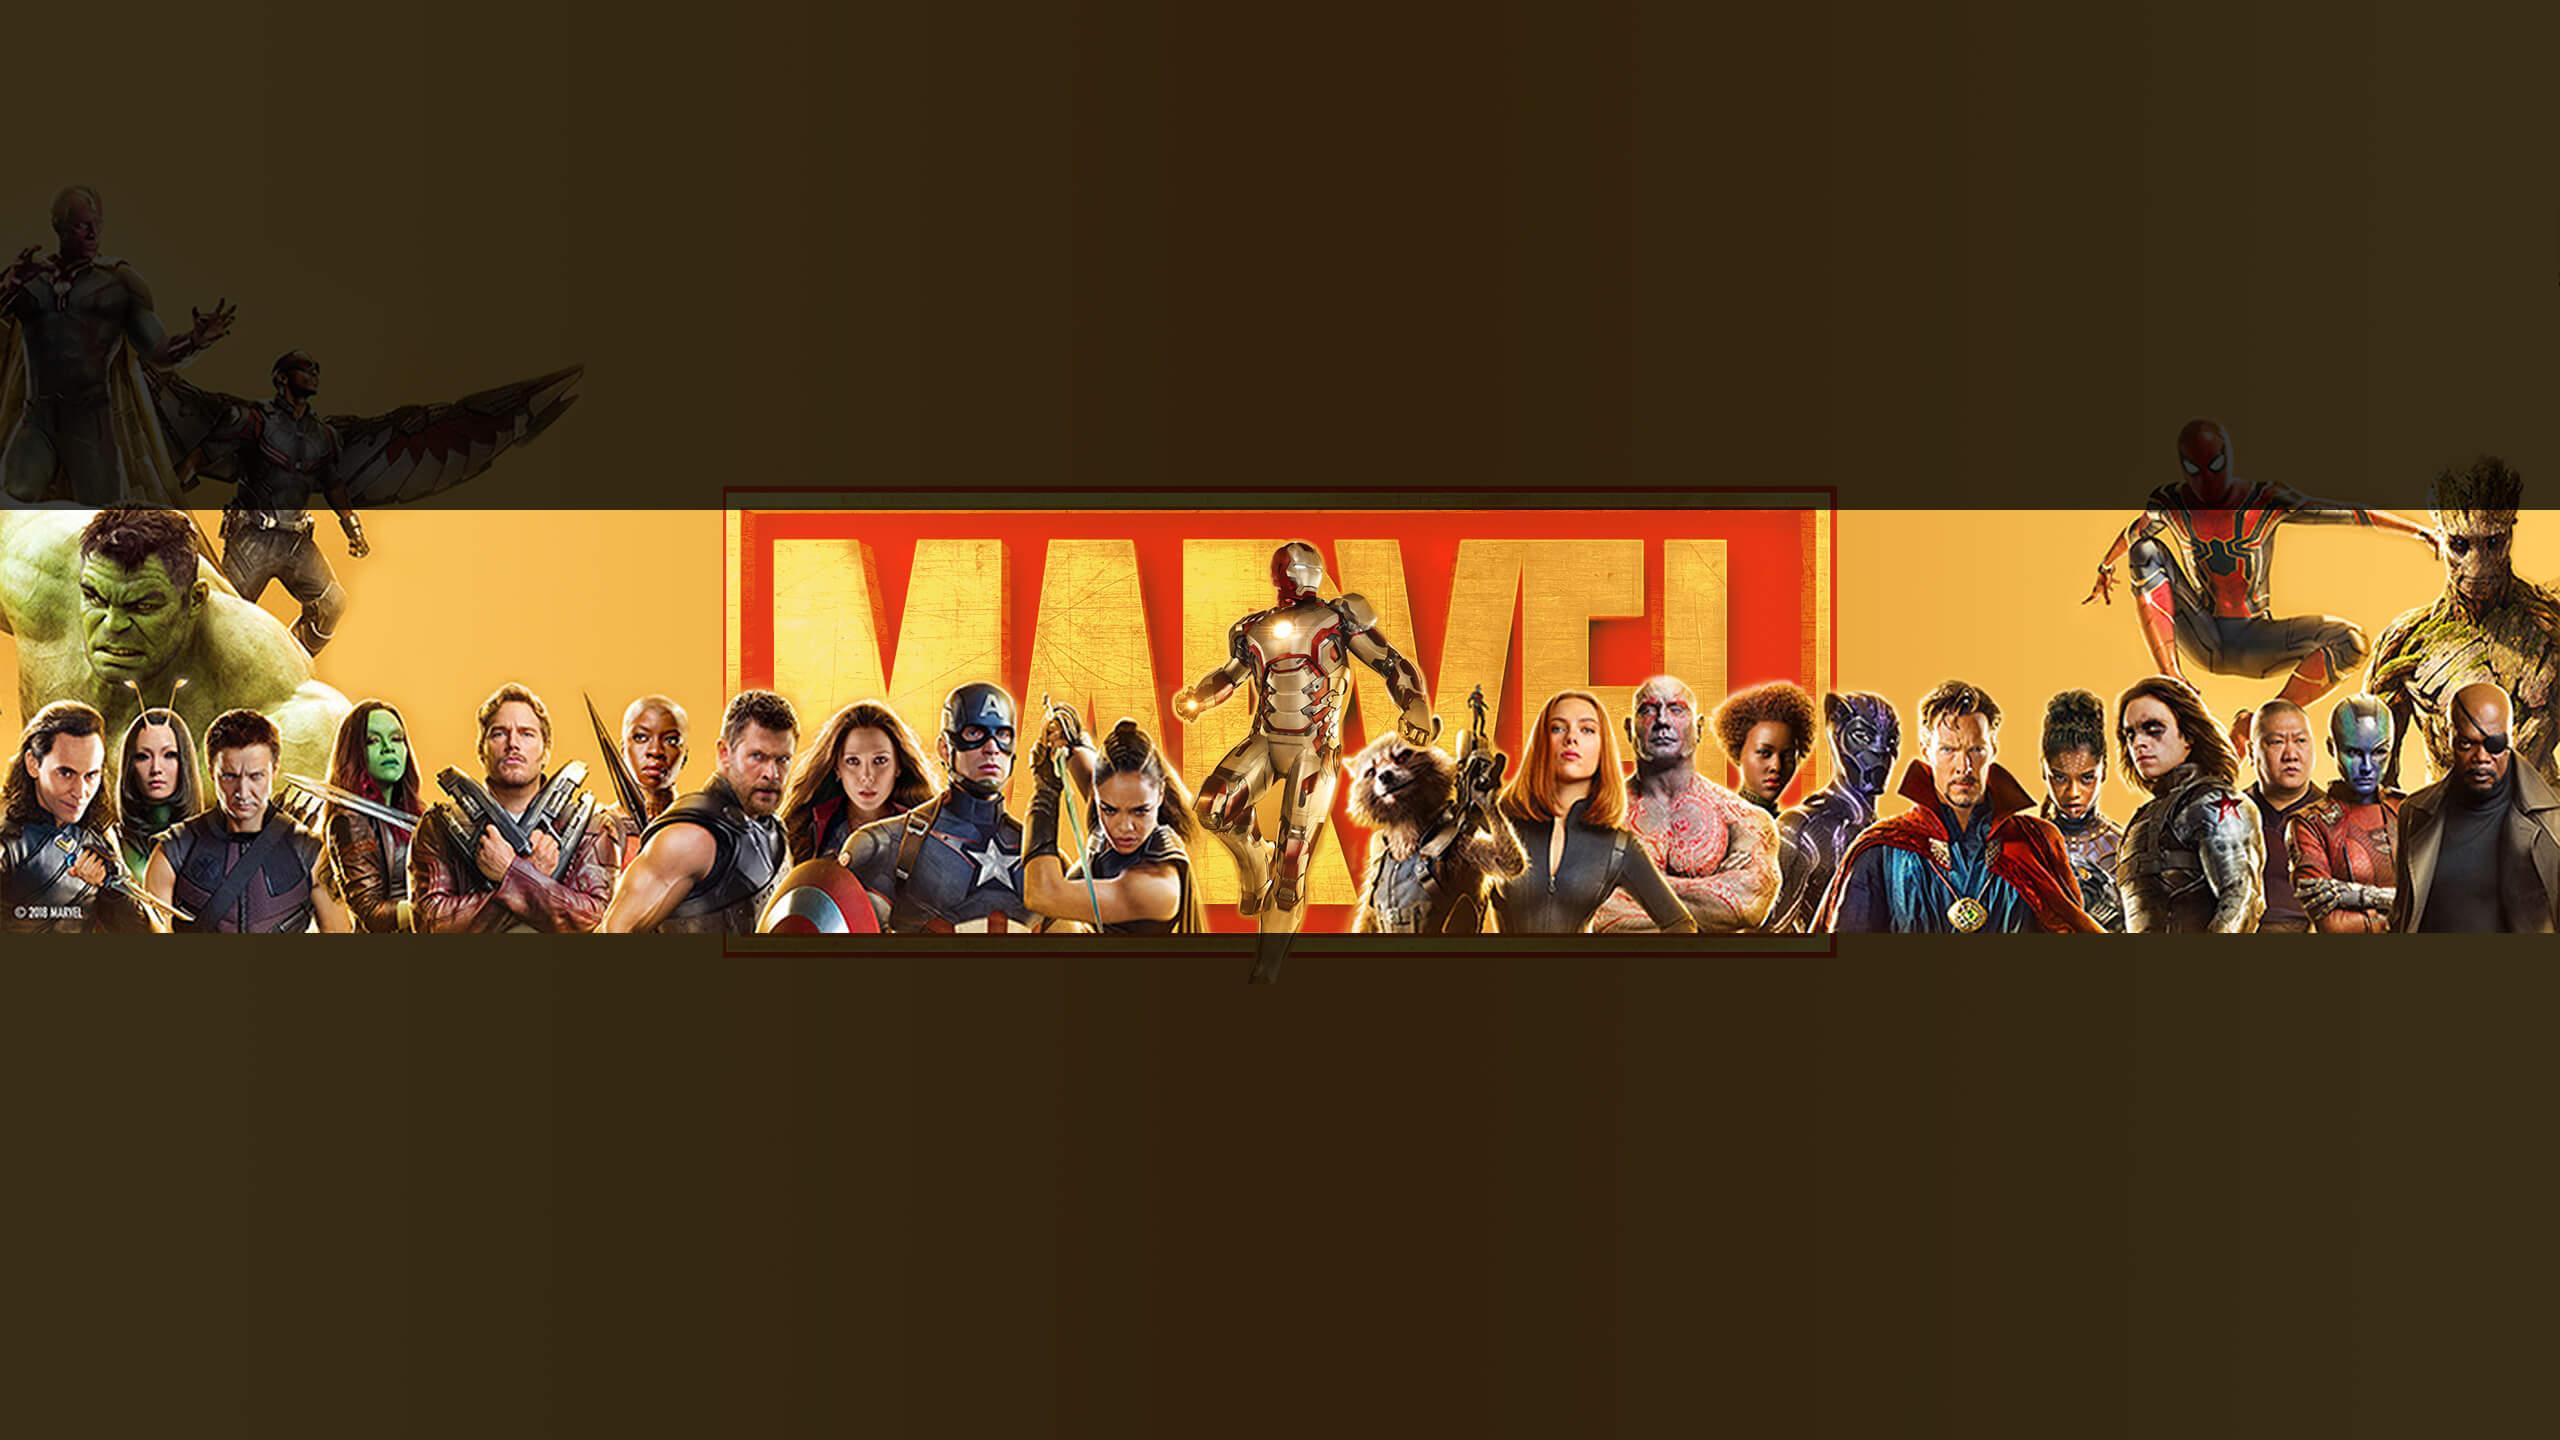 Картинка с фантастическими персонажами на фоне надписи Марвел.